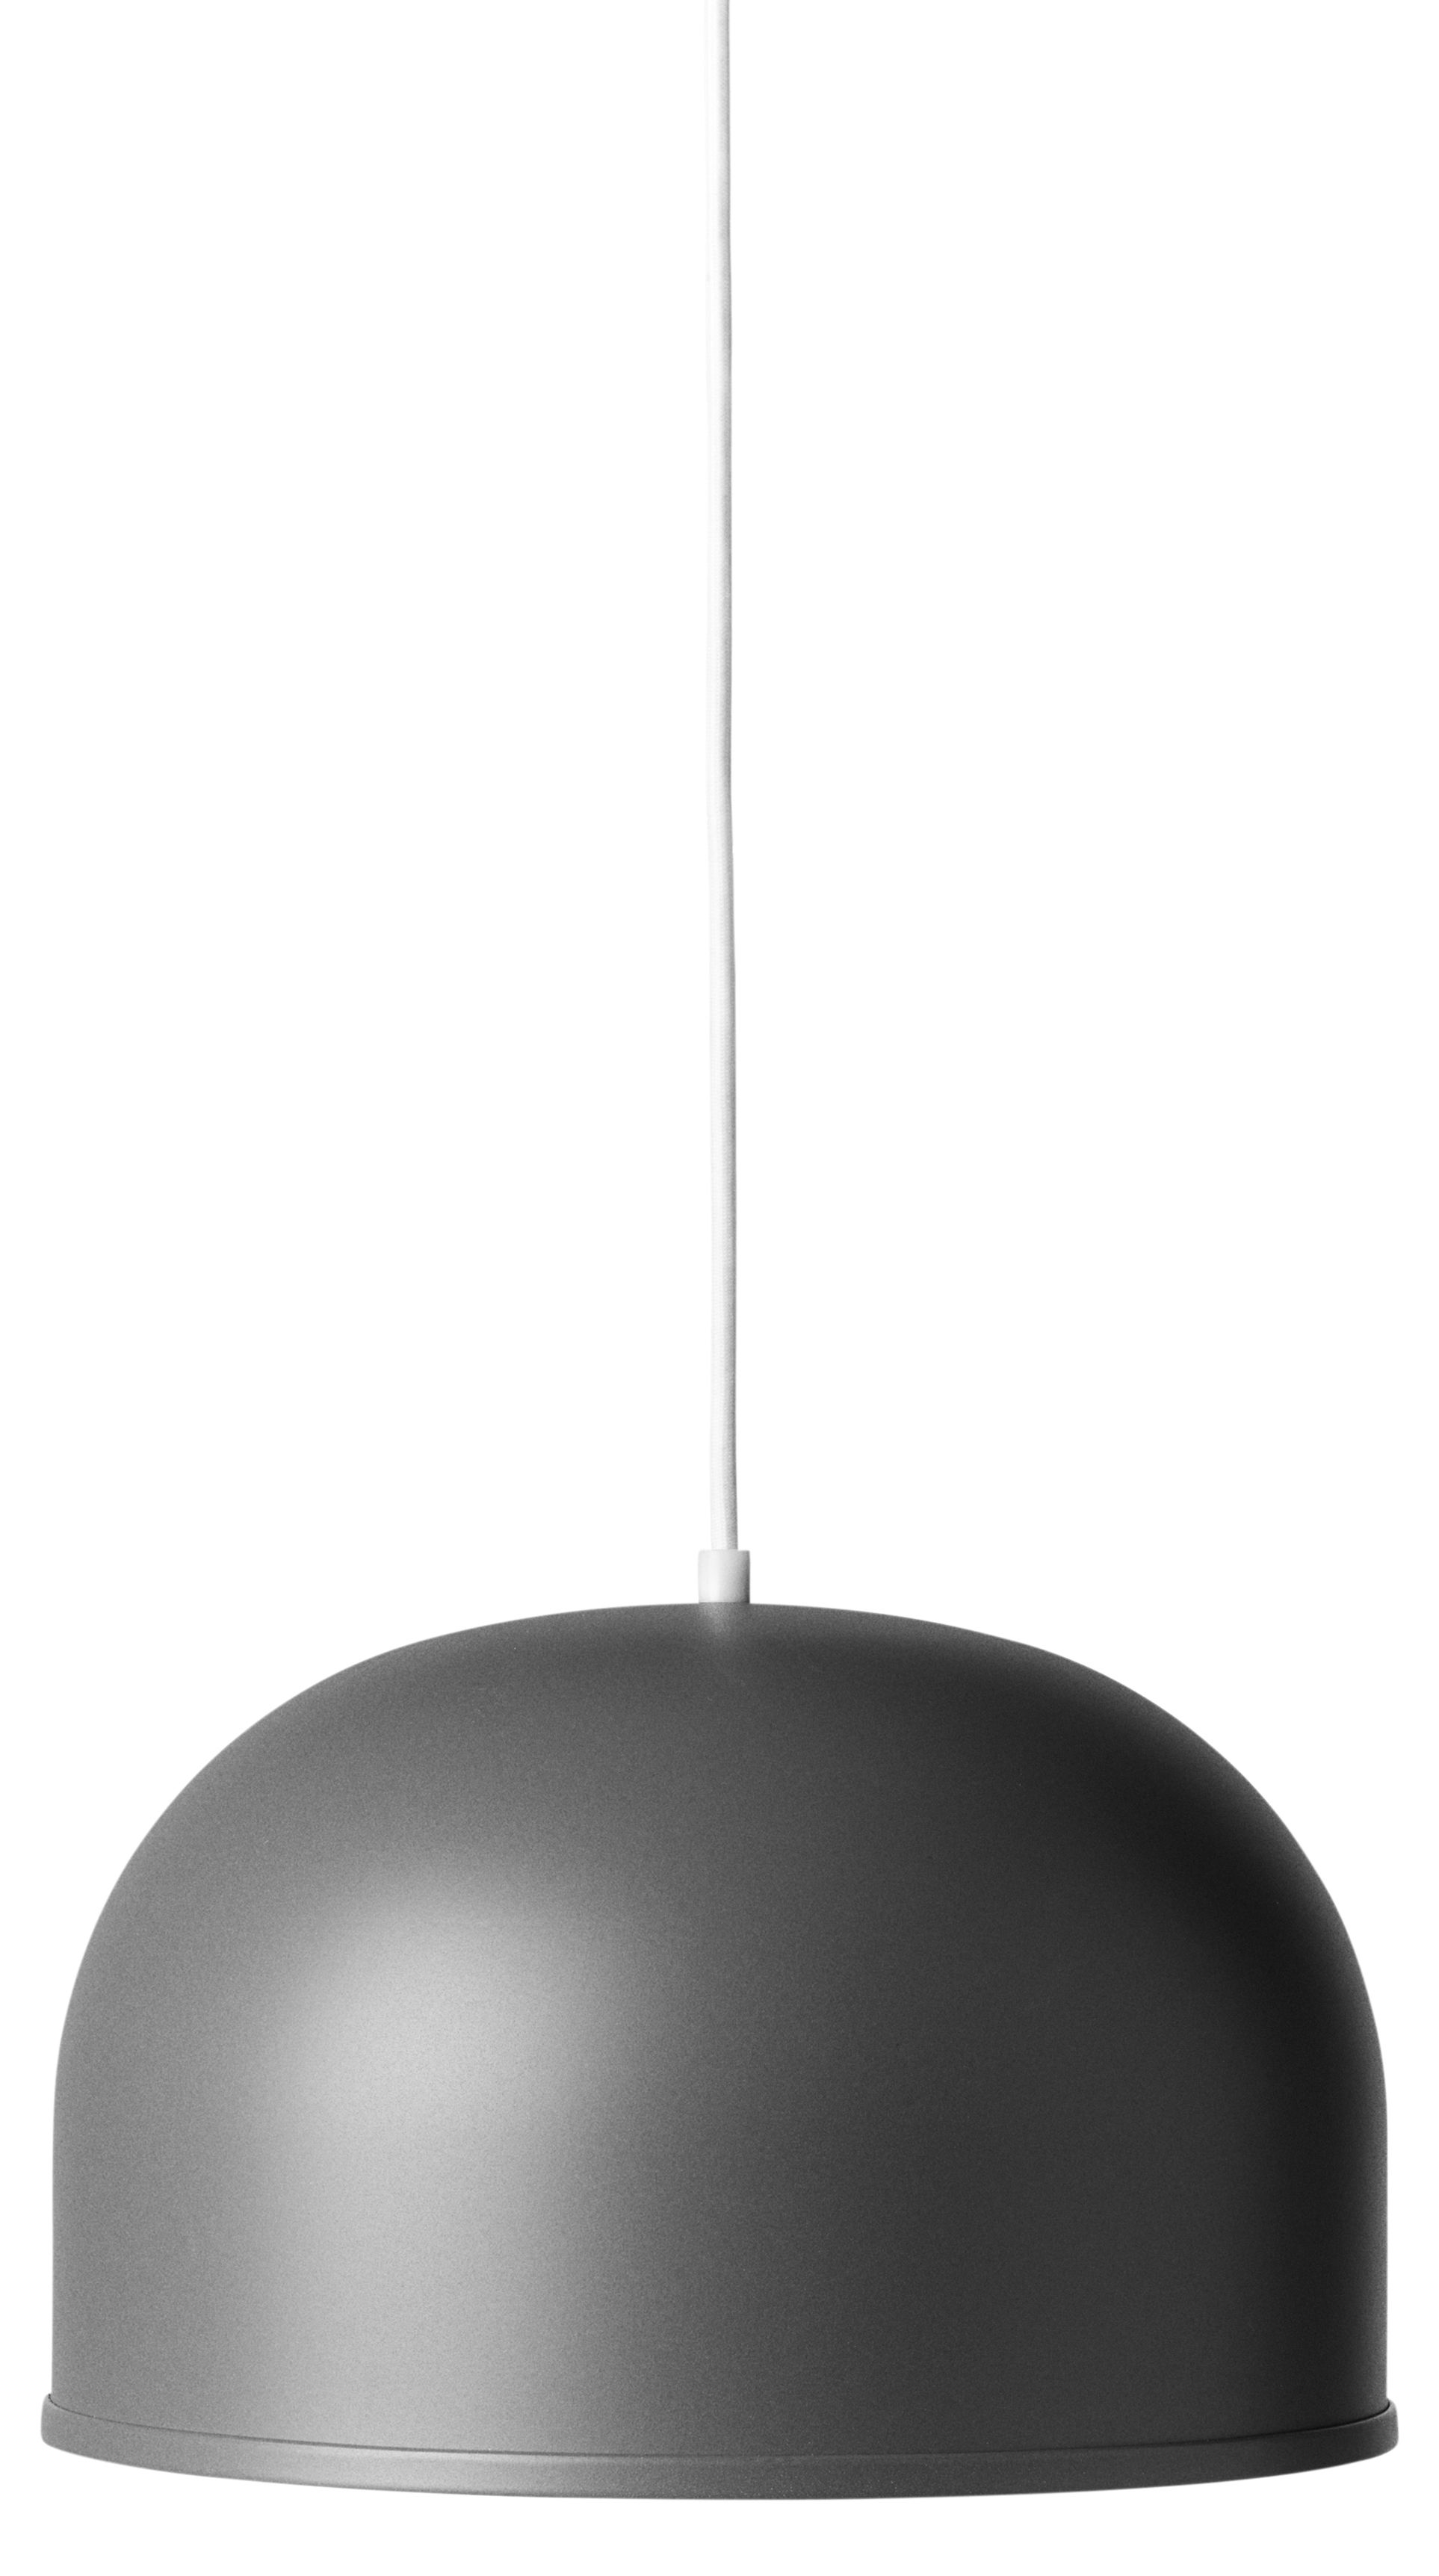 Luminaire - Suspensions - Suspension GM / Ø 30 cm - Métal - Menu - Anthracite - Acier laqué